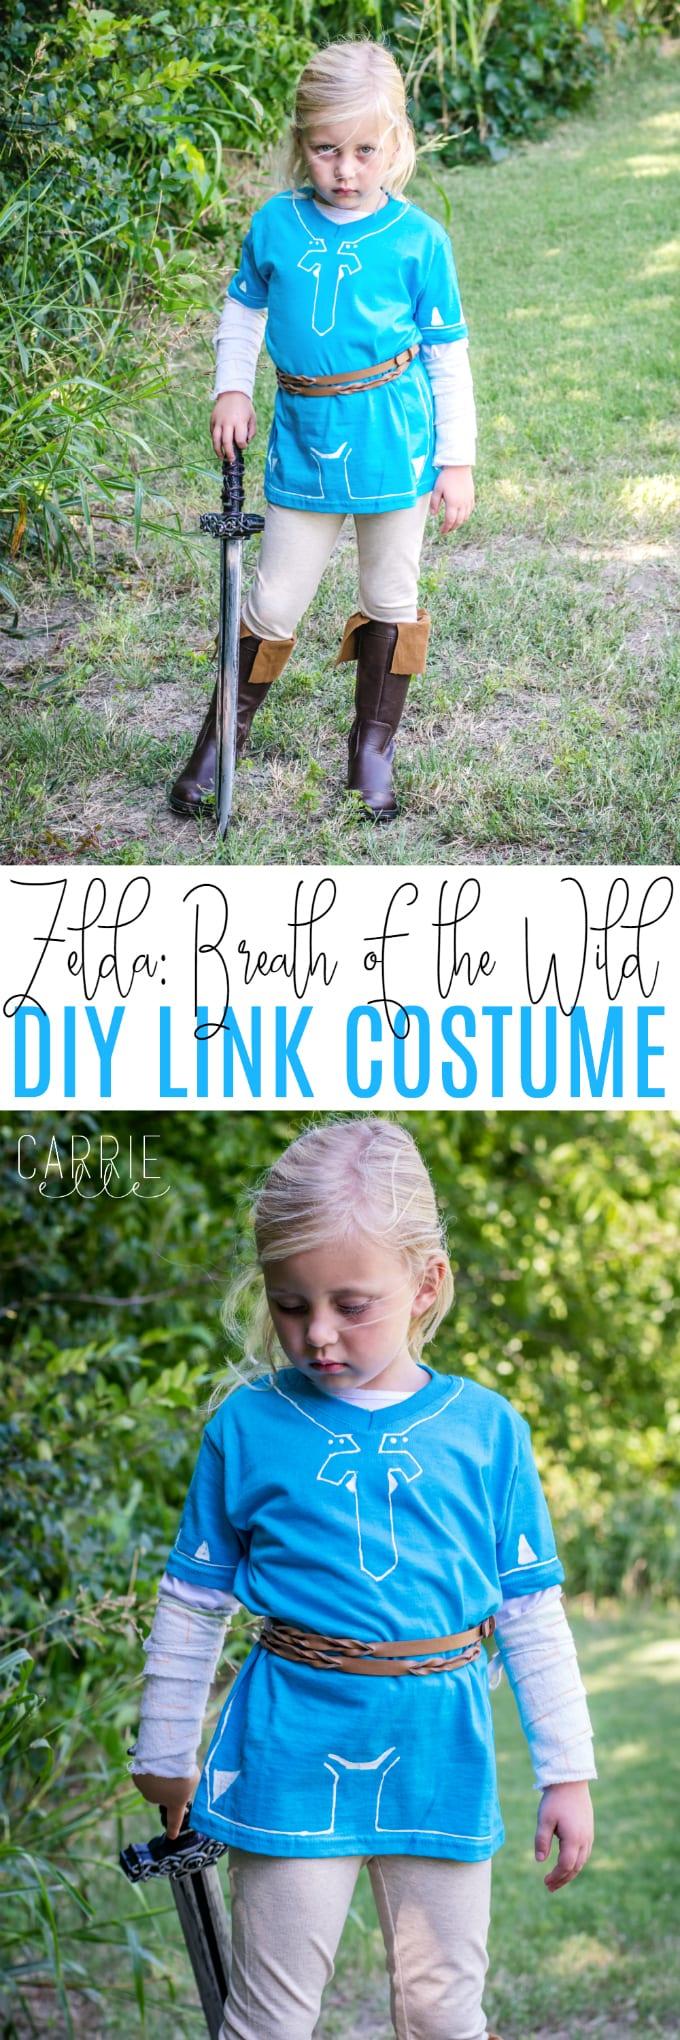 DIY Link Costume